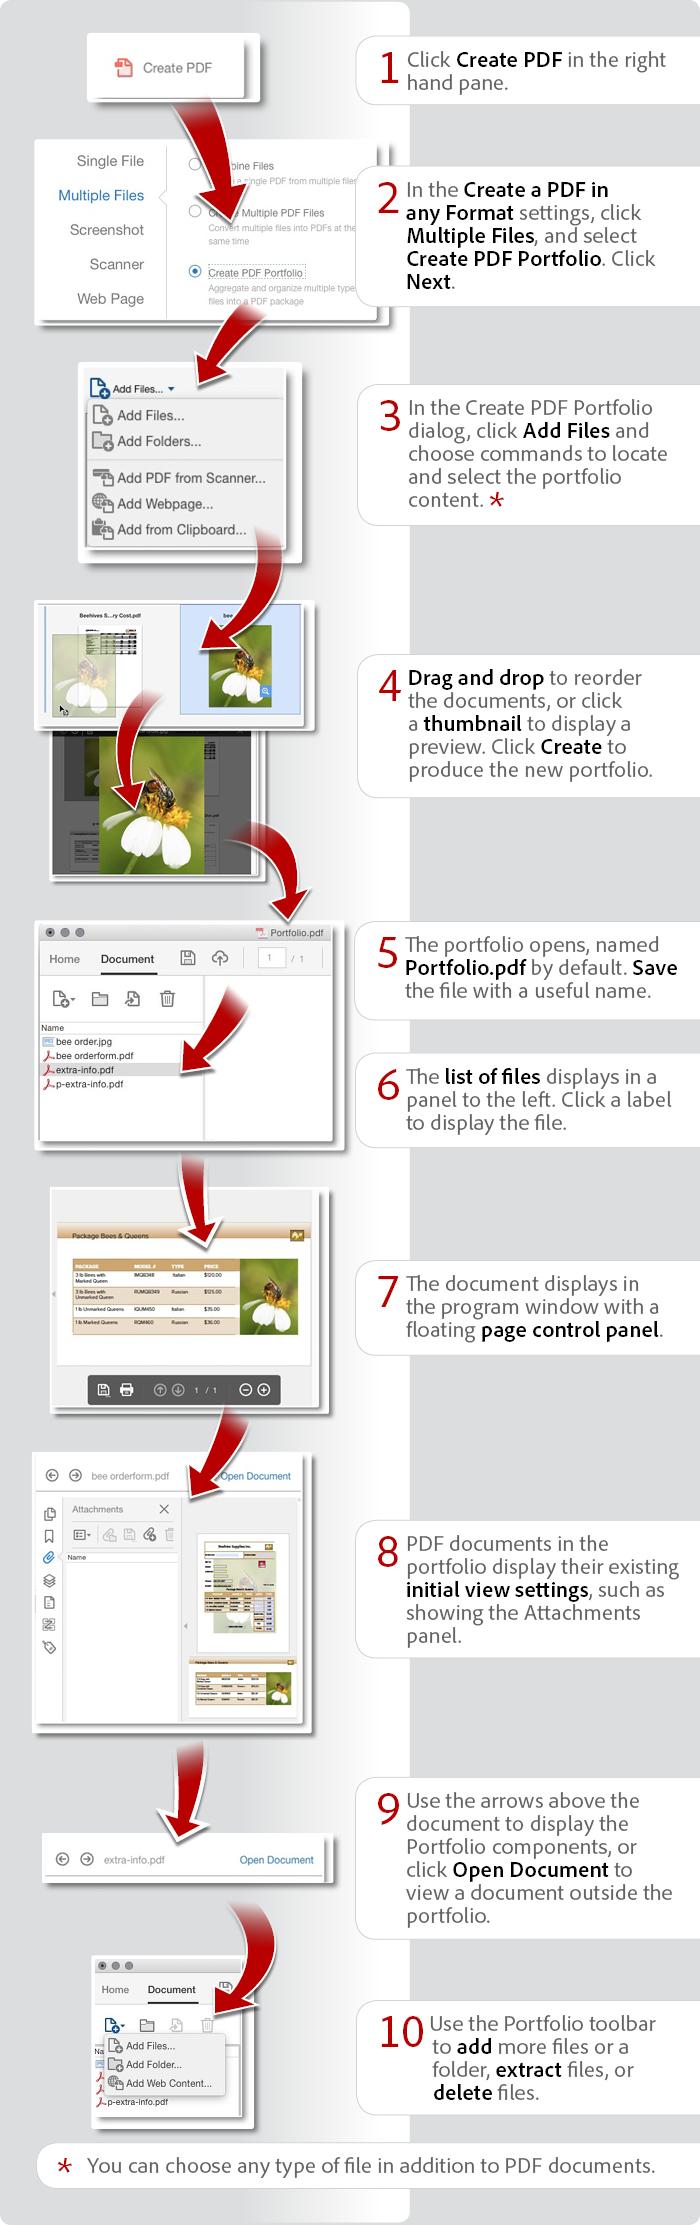 How To Combine Files To Create A Pdf Portfolio Using Acrobat Dc Pdf Combination Tutorial